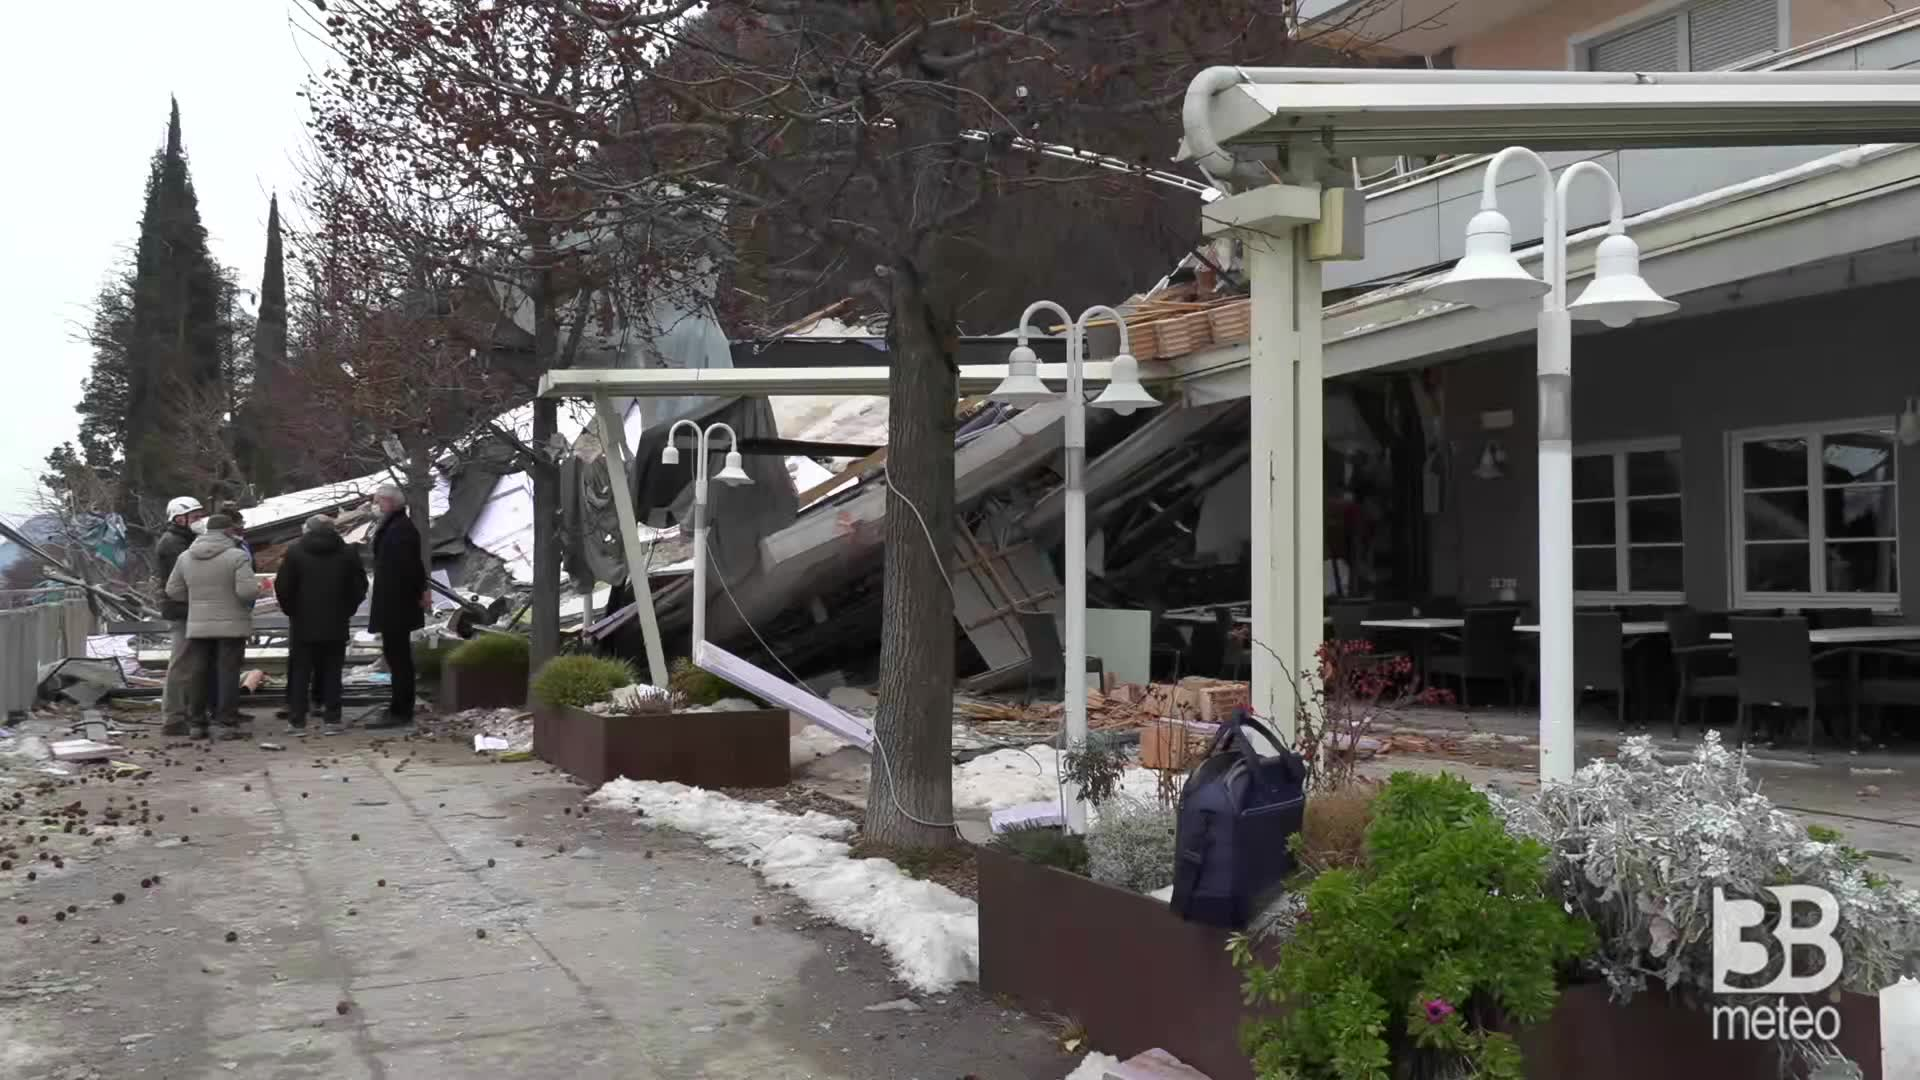 Frana hotel Eberle, i detriti: massi e devastazione